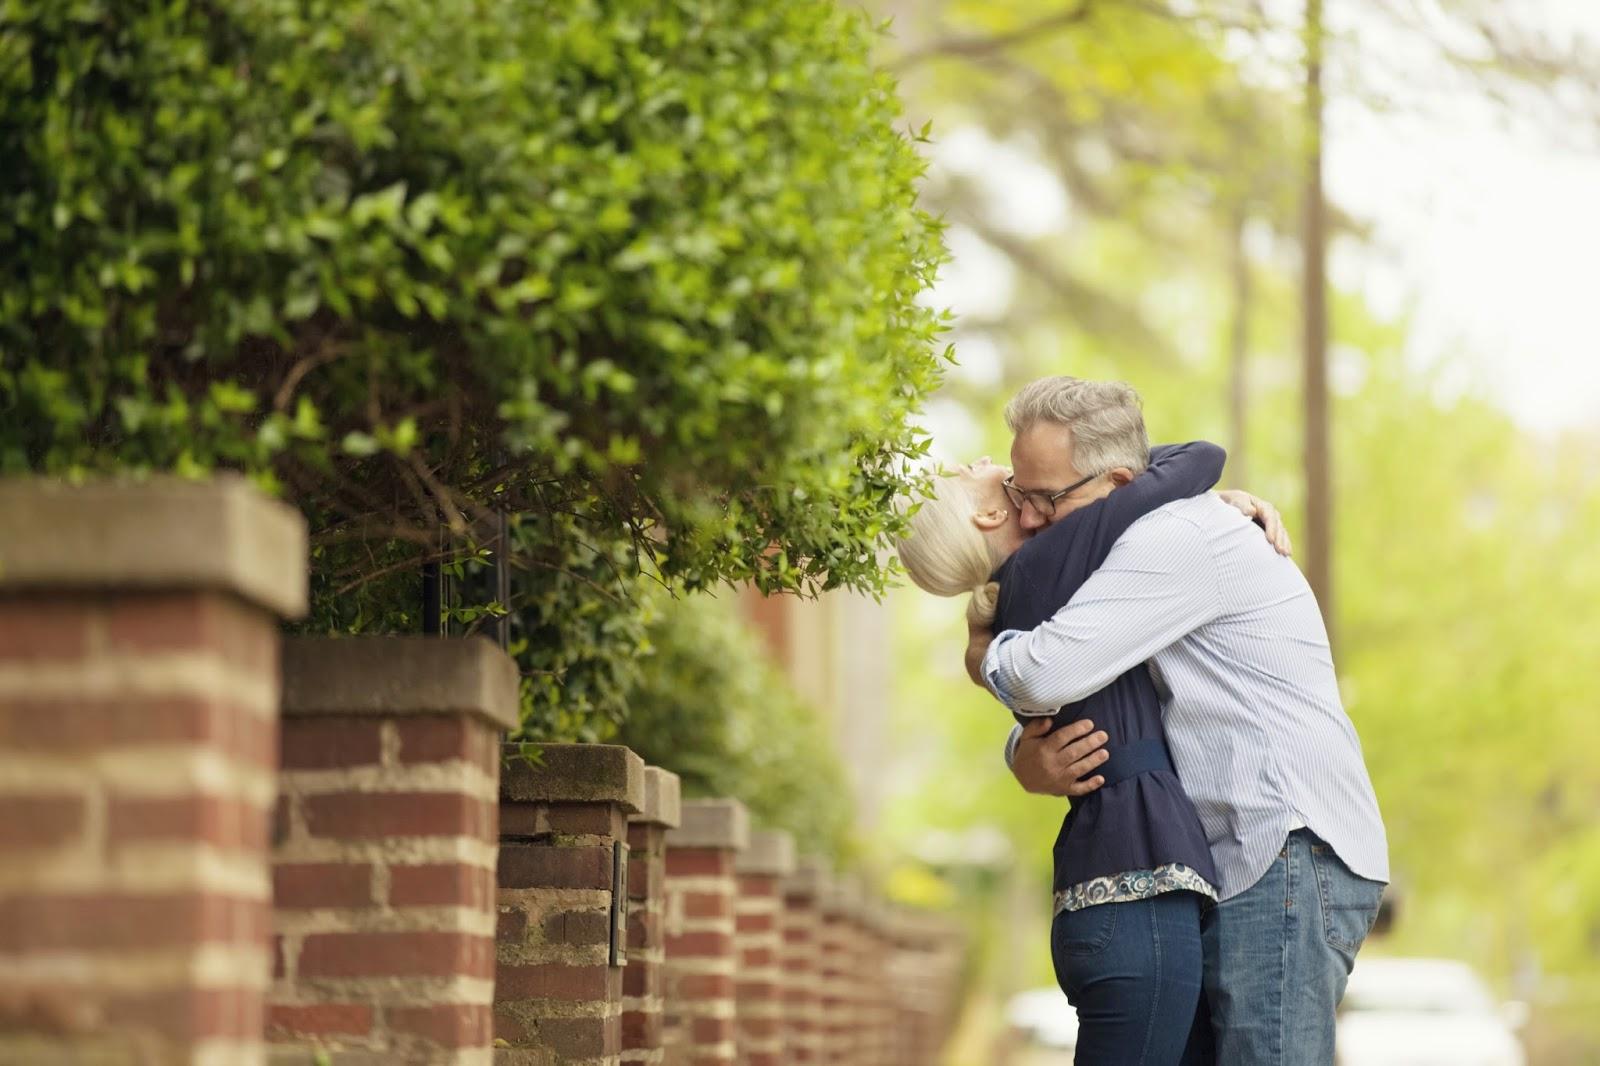 couple hugging in street on onequartermama.ca